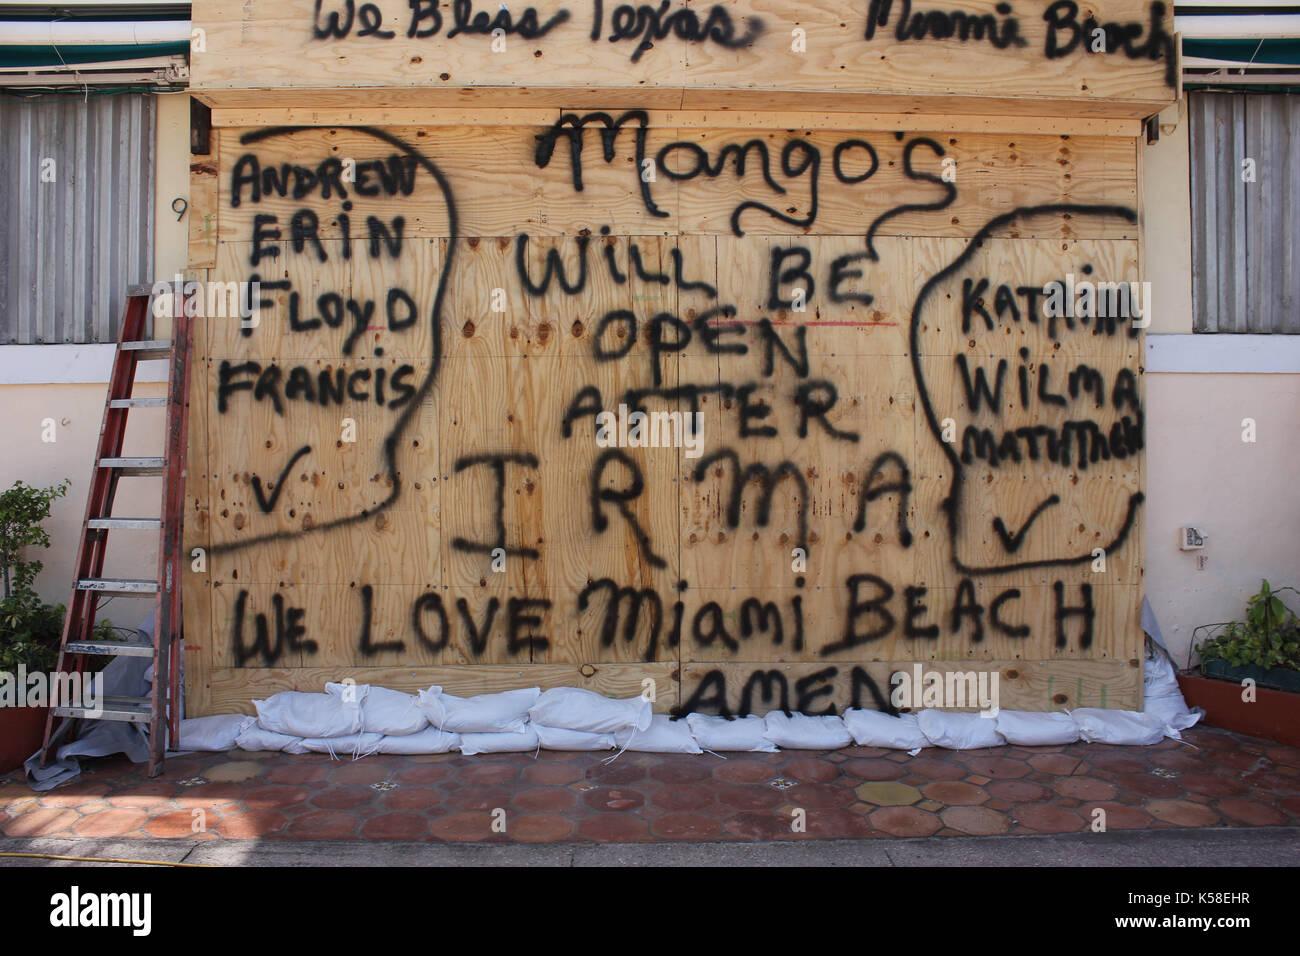 Miami Beach, playas desiertas, pre huracán irma, septiembre 8, 2017 Foto de stock